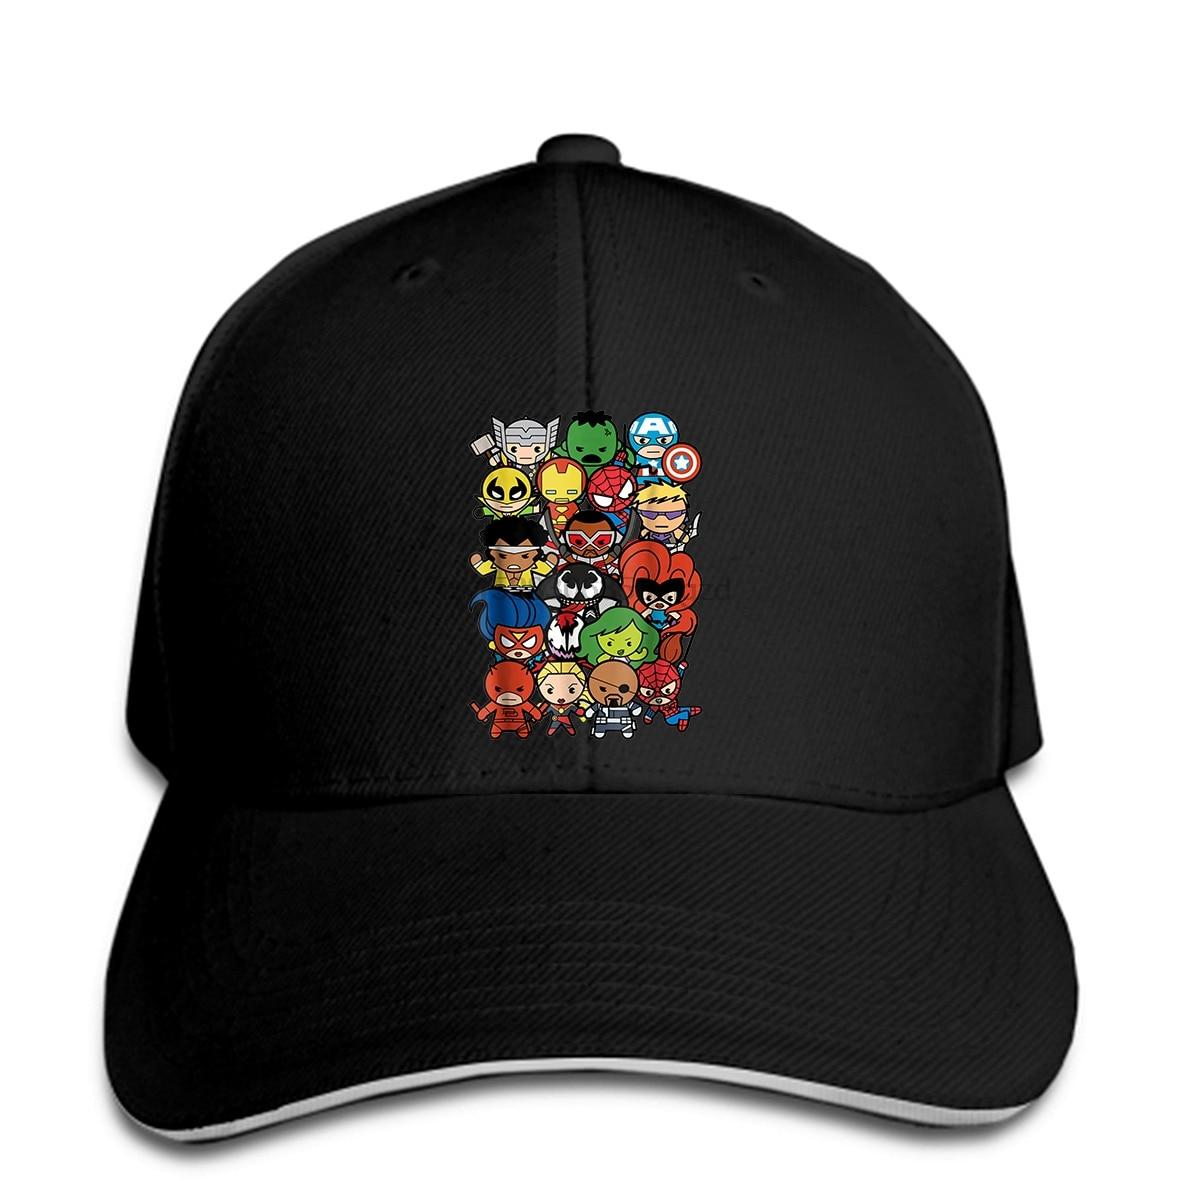 Funny Men Men Baseball Cap Women novelty Heroes And Villains Team Kawaii Graphic Men Baseball Cap Snapback Cap Women Hat Peaked